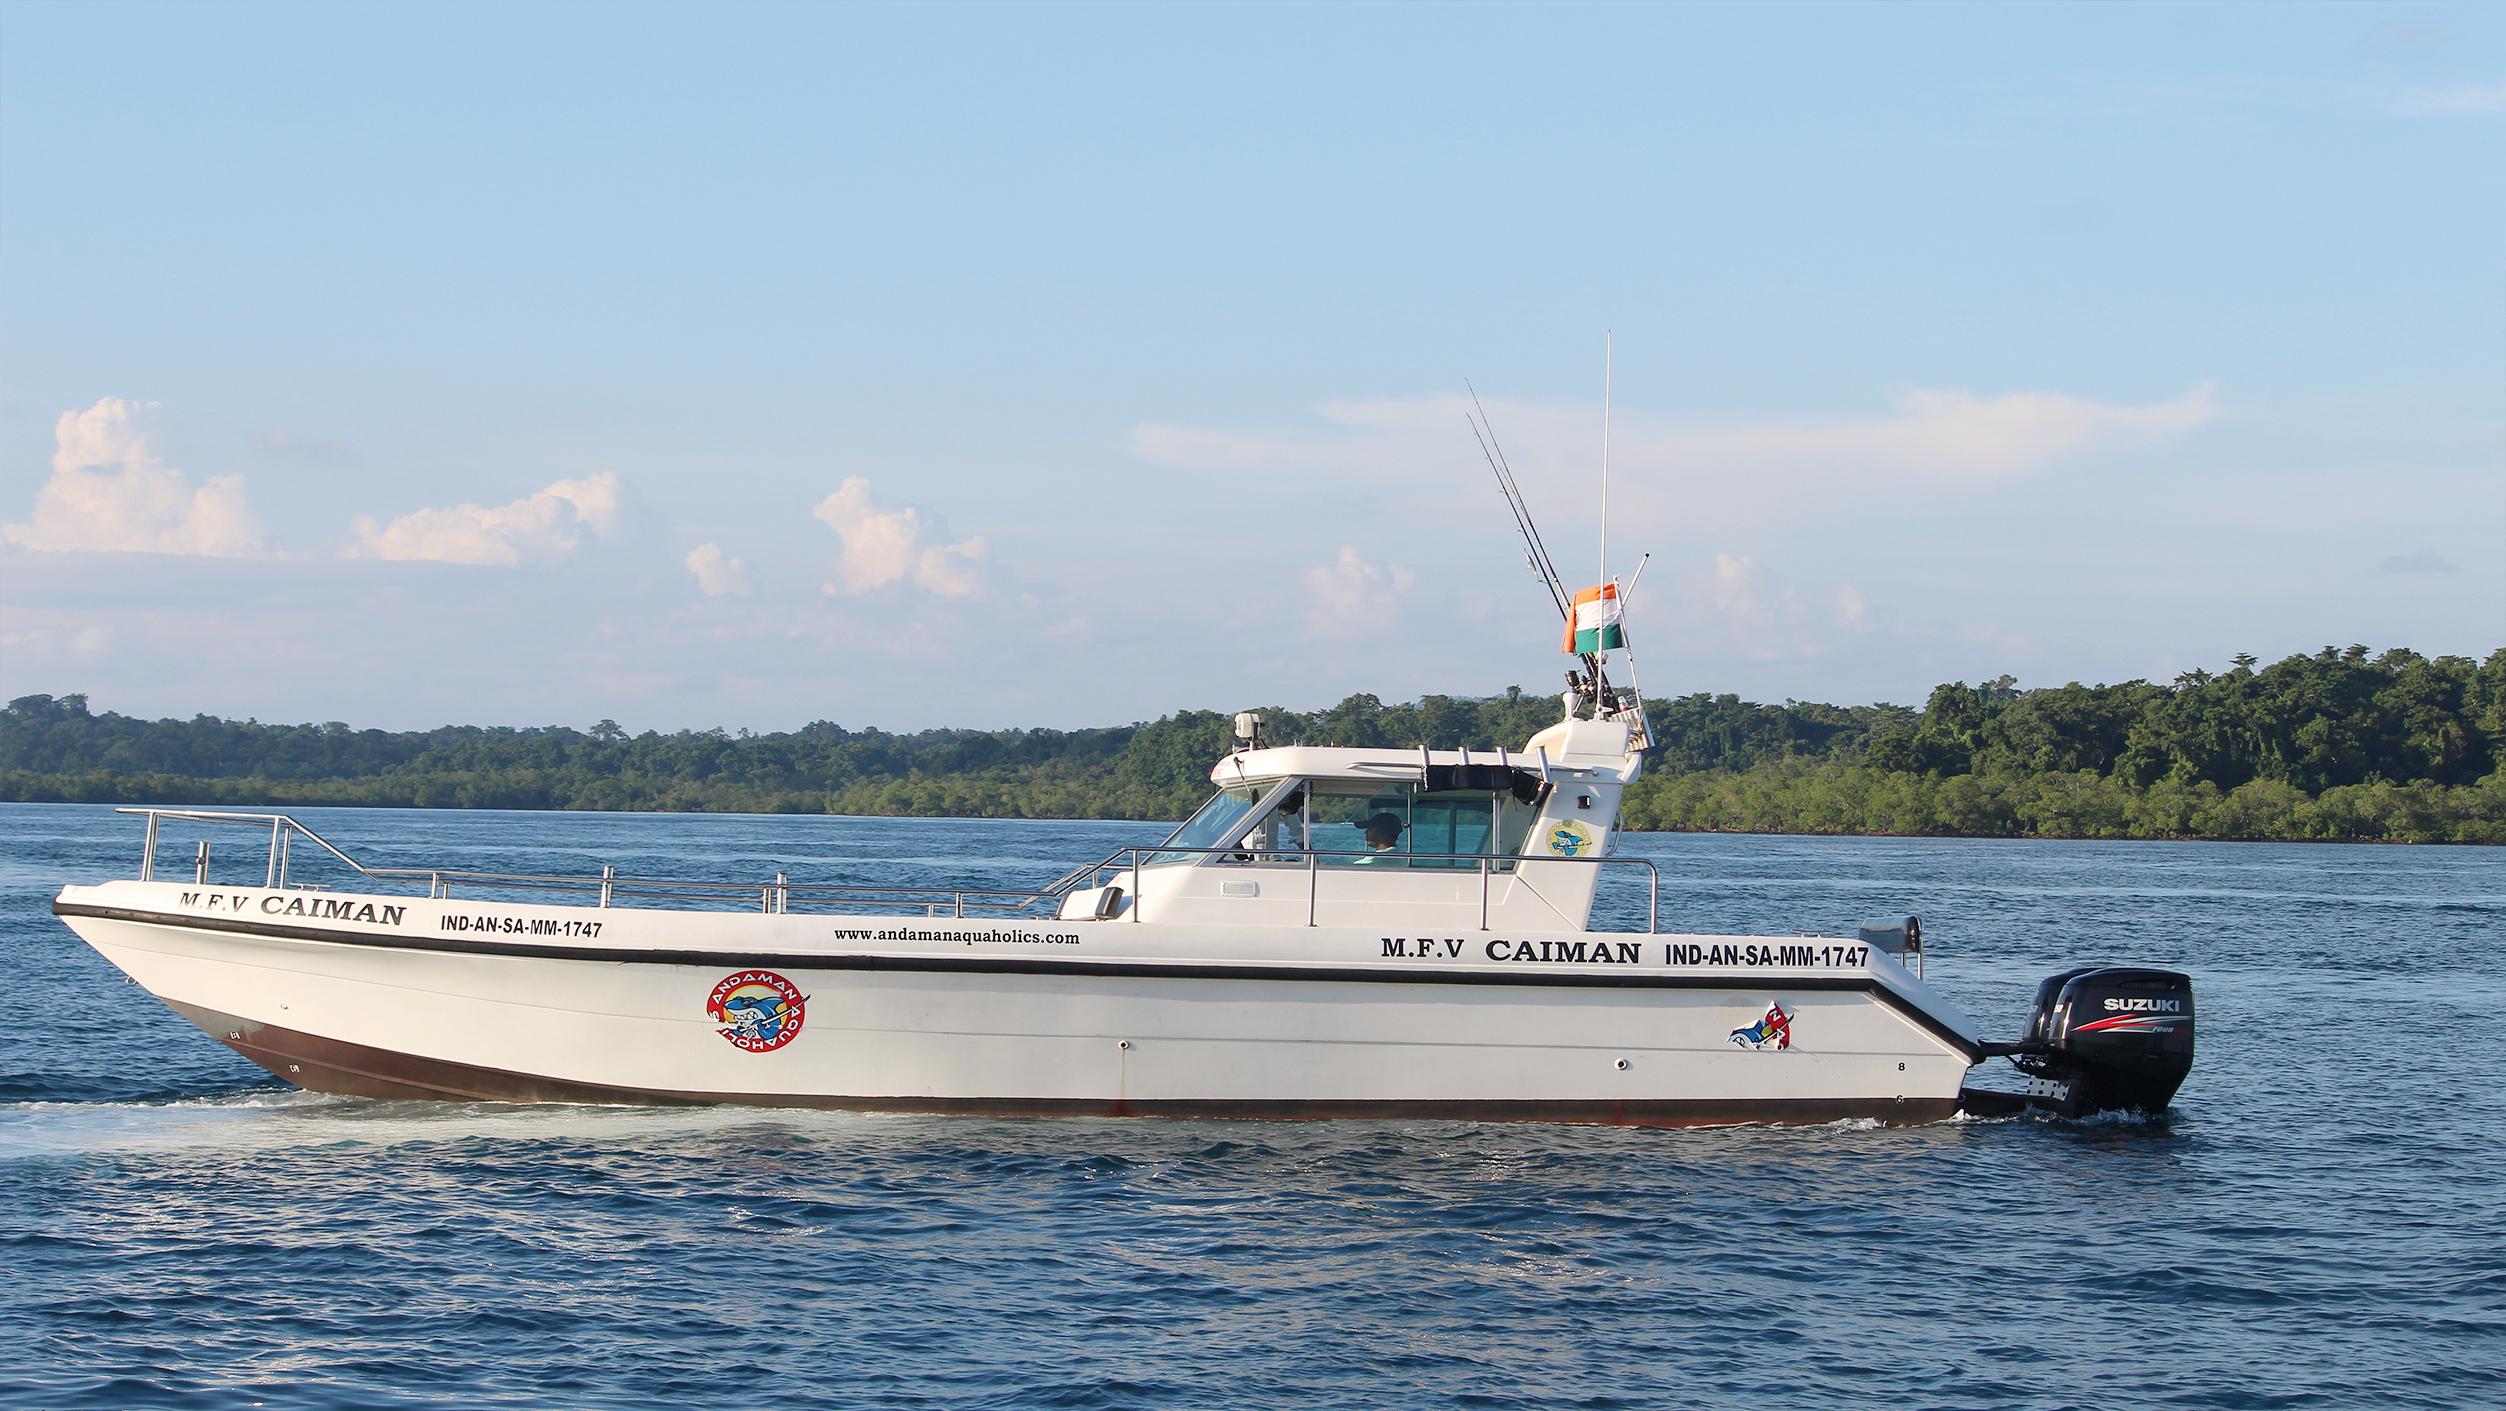 MFV Caiman fishing boat in india